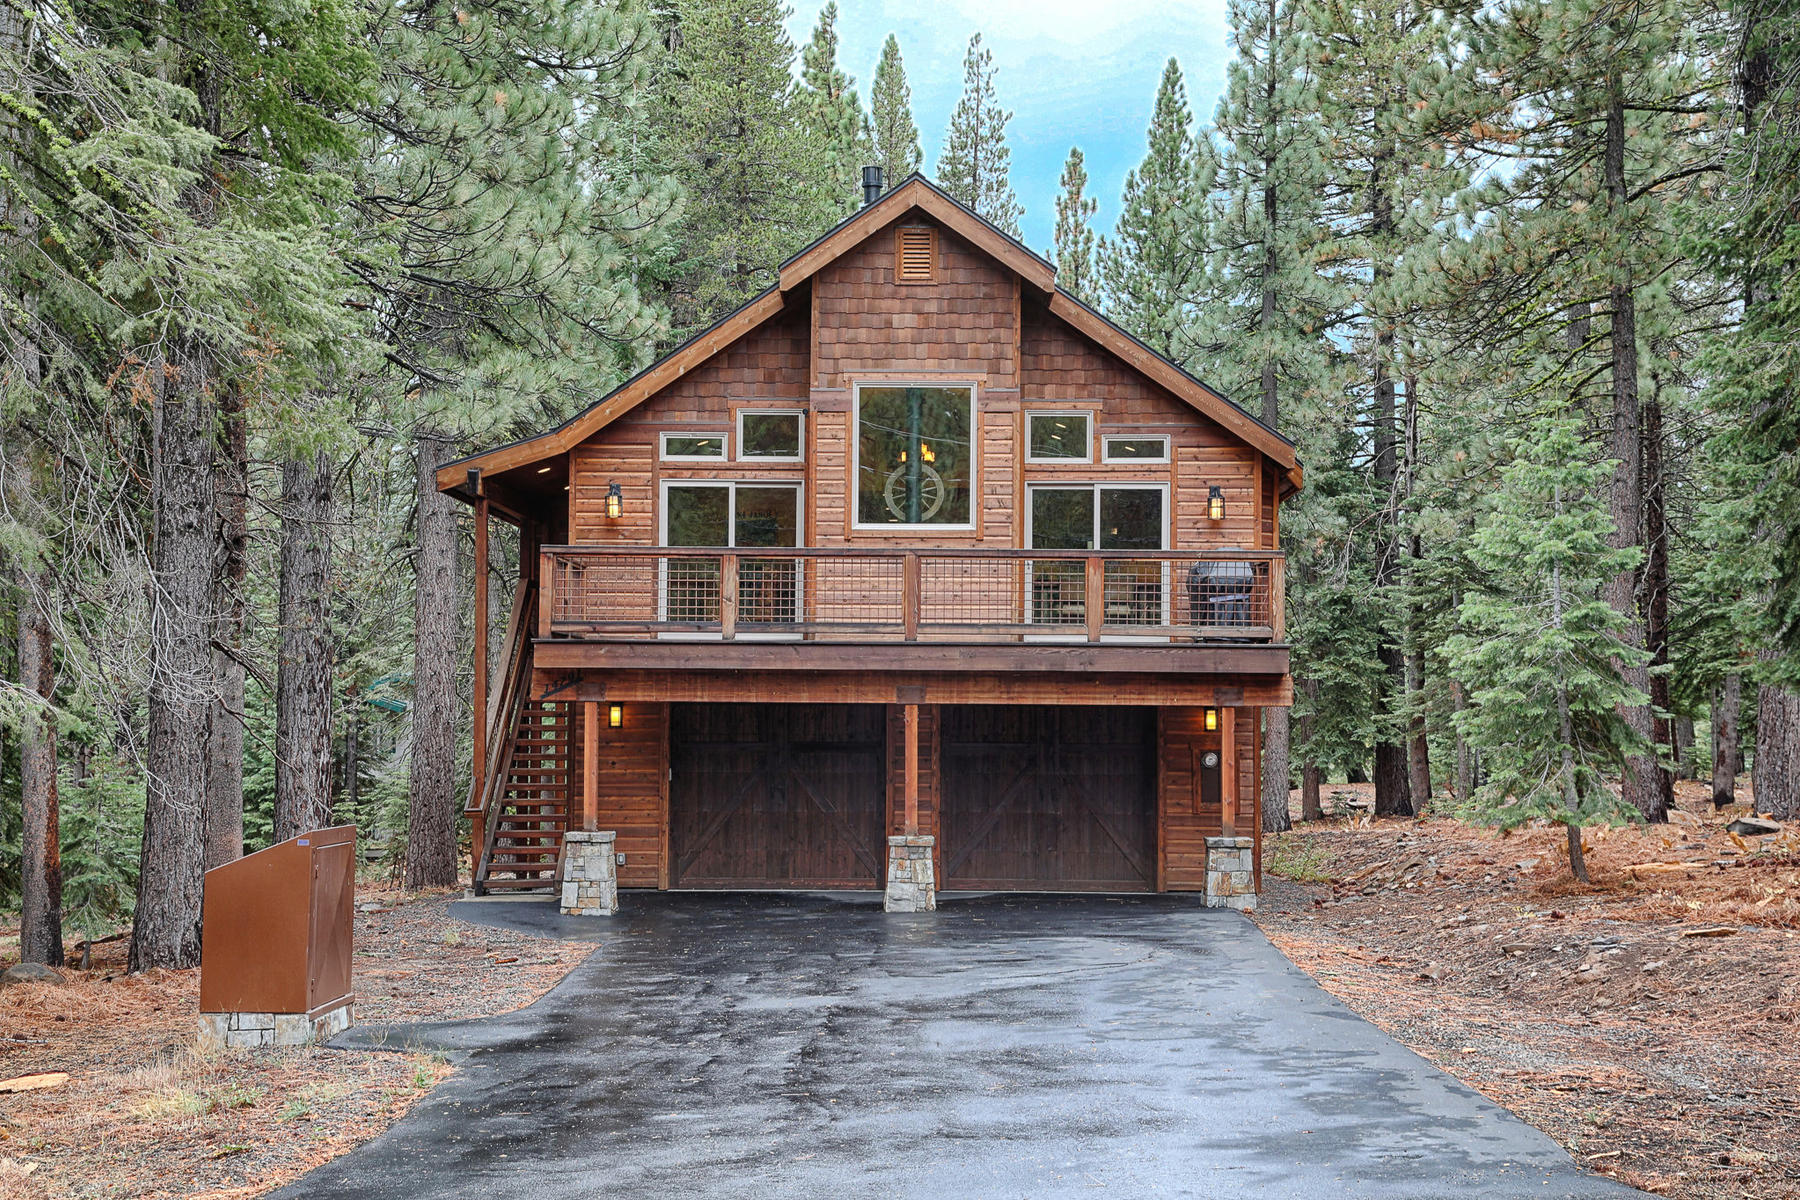 Property 为 销售 在 14791 Tyrol Road, Truckee CA 14791 Tyrol Road 特拉基, 加利福尼亚州 96161 美国